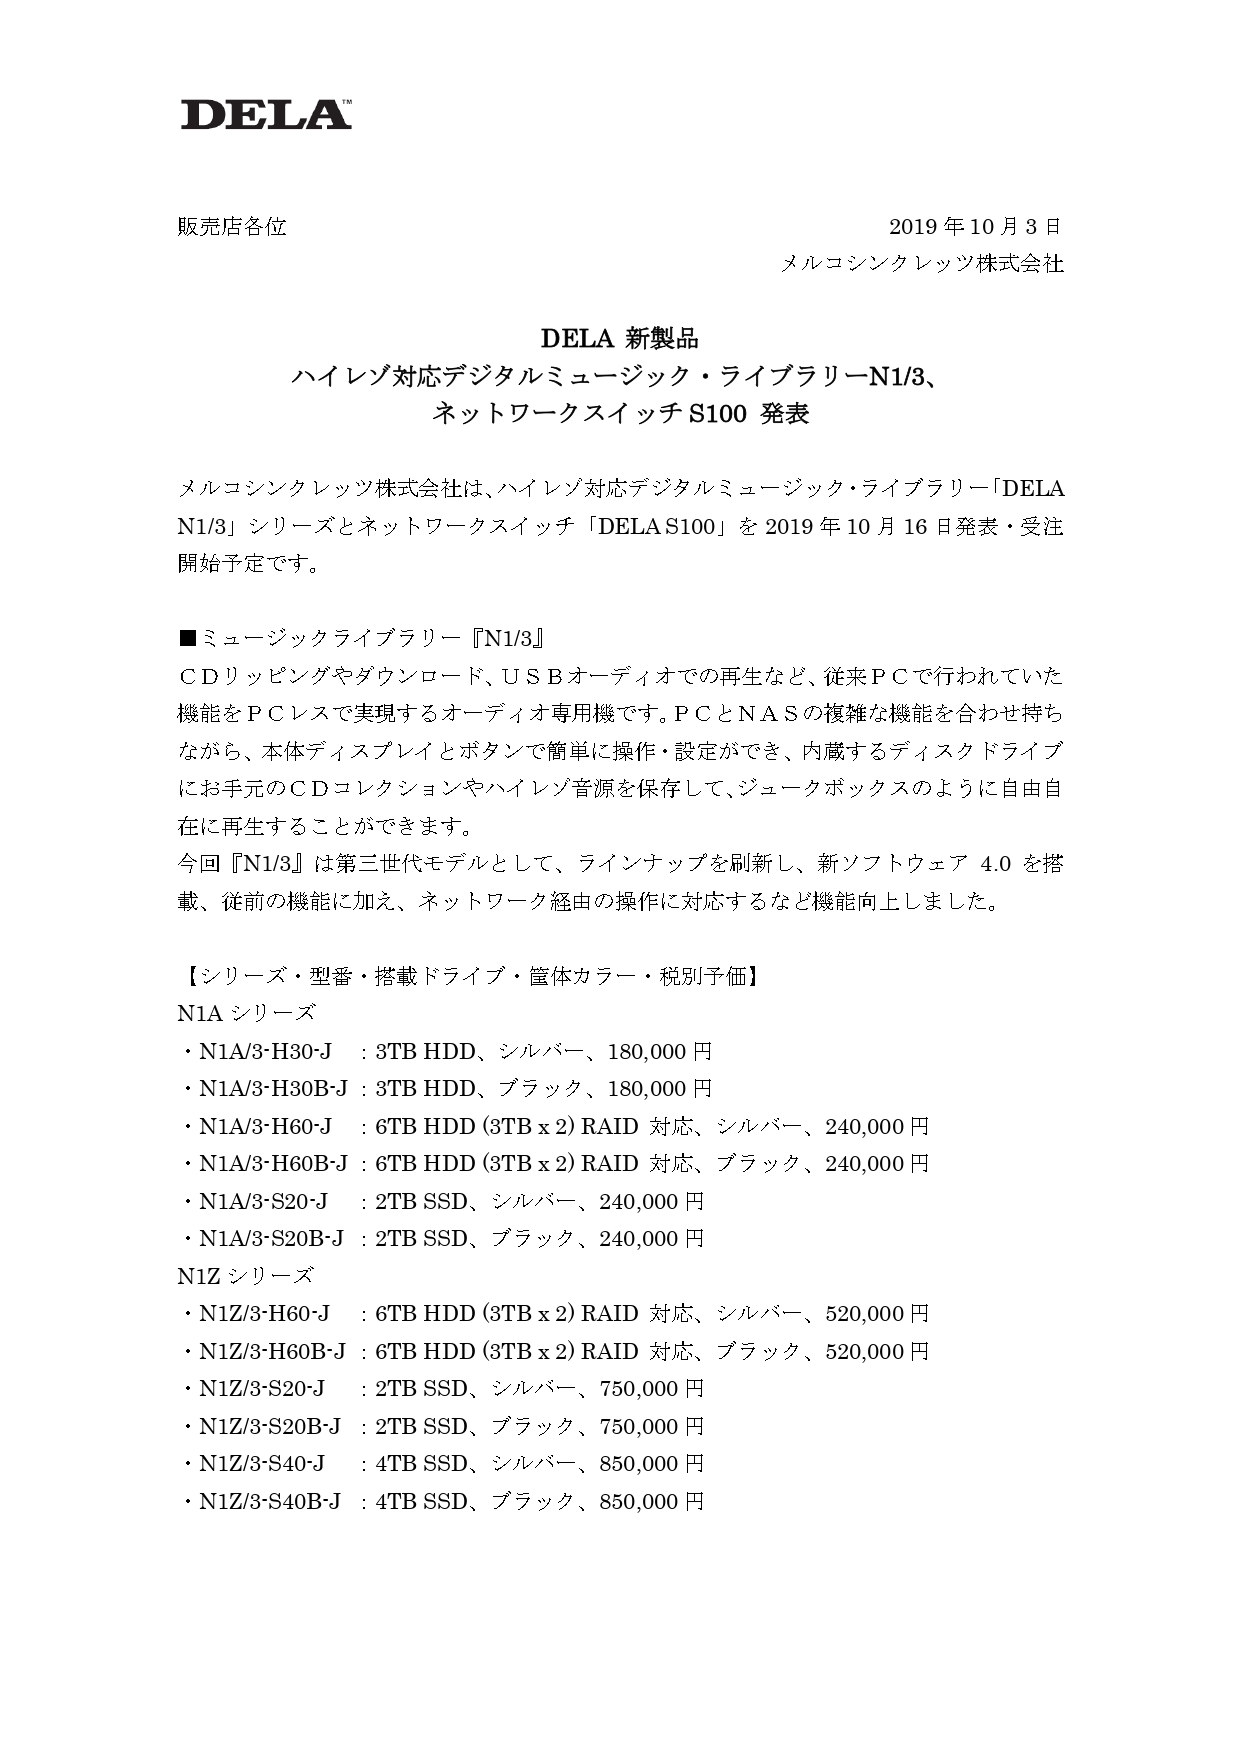 DELA 新製品 N1 MK3, S100_page-0001